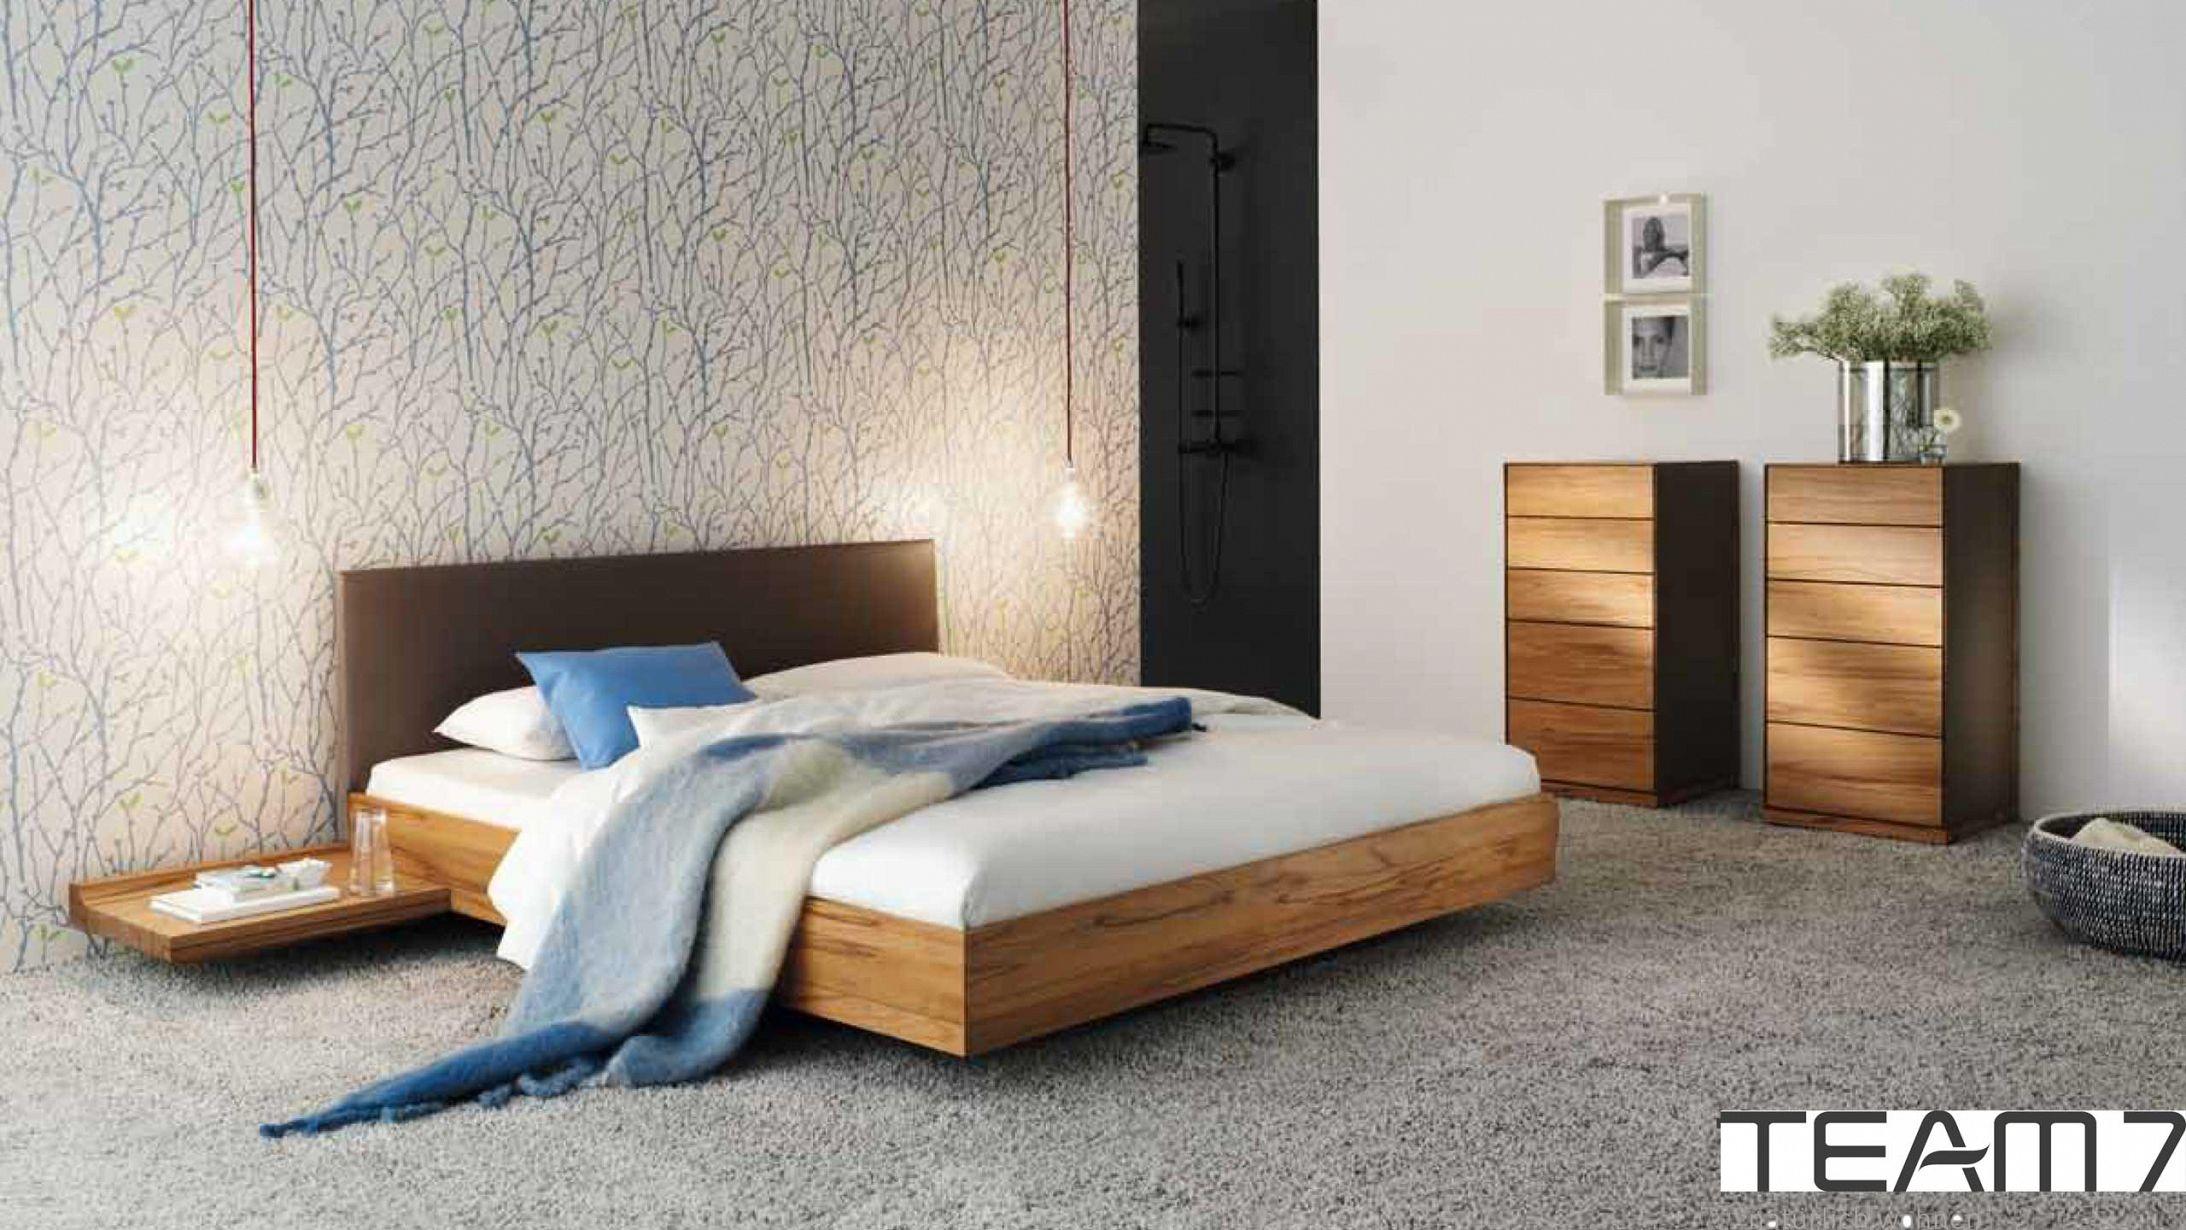 team7 bettnox m bel braum. Black Bedroom Furniture Sets. Home Design Ideas